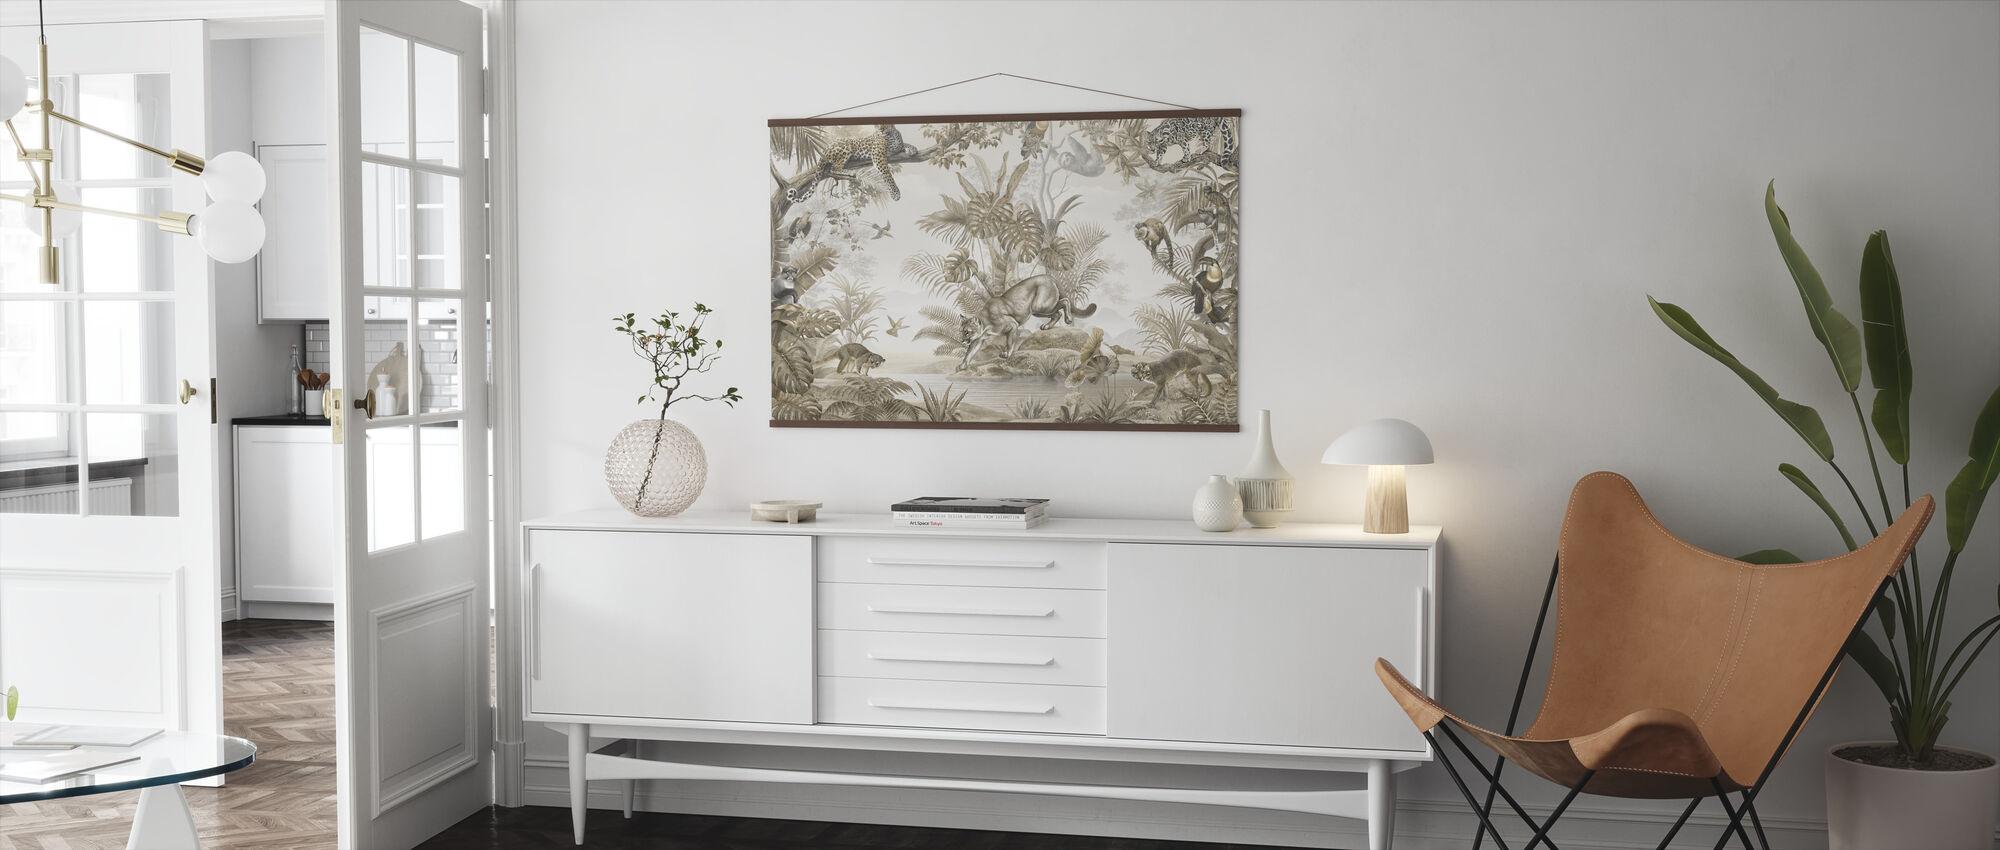 Jungle Hangout - Sepia - Poster - Living Room